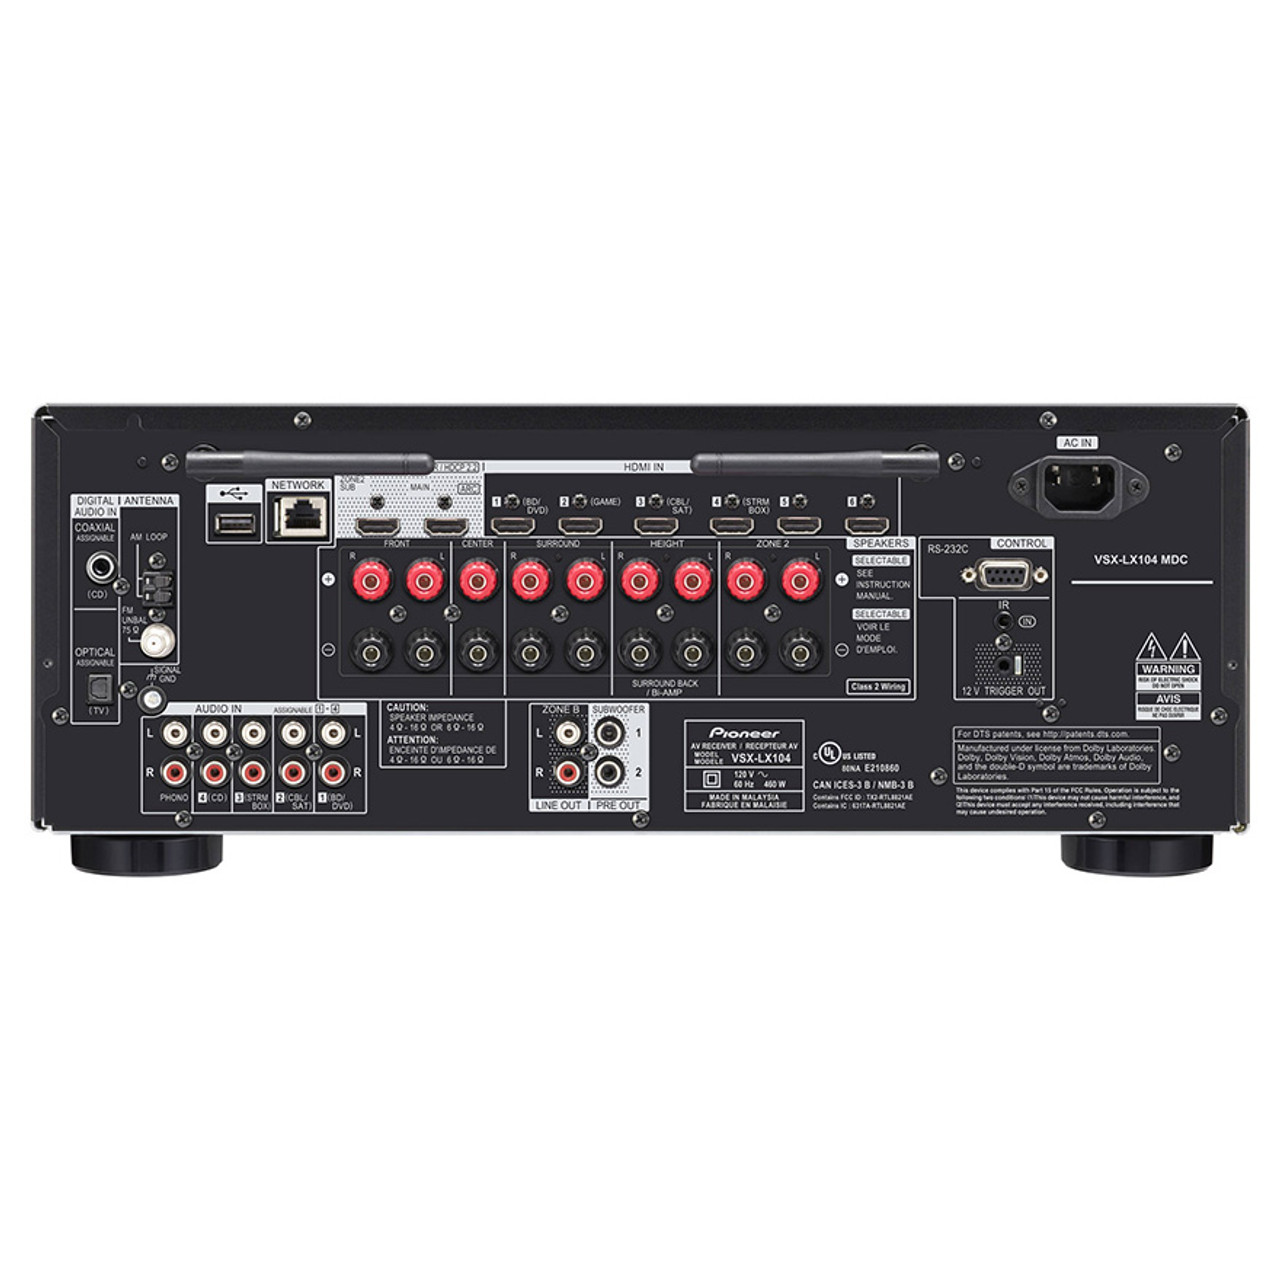 Pioneer VSX-LX104 7.2-ch Network AV Receiver